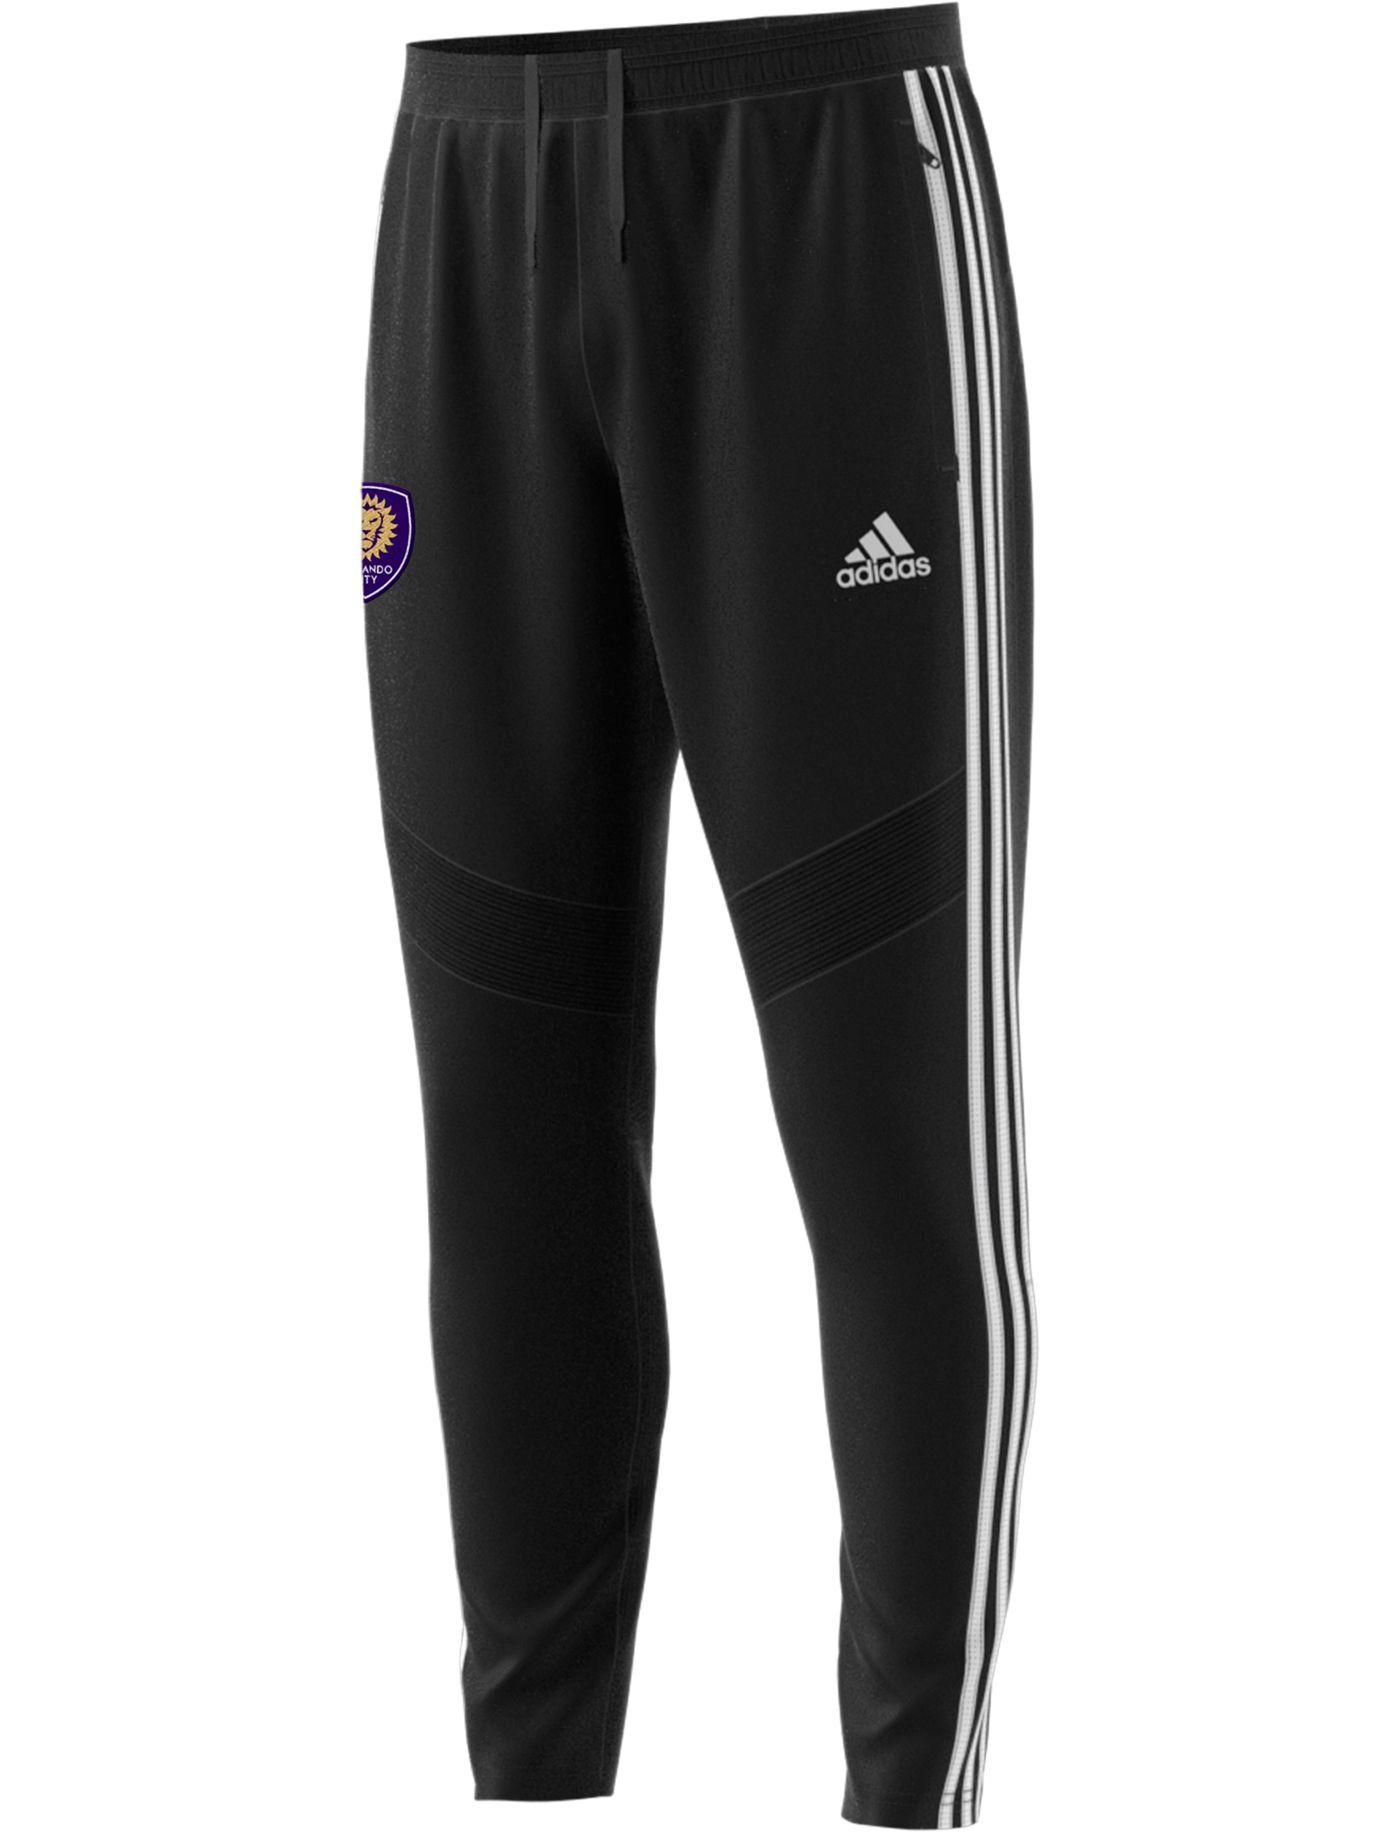 adidas Men's Orlando City Tiro Black Pants